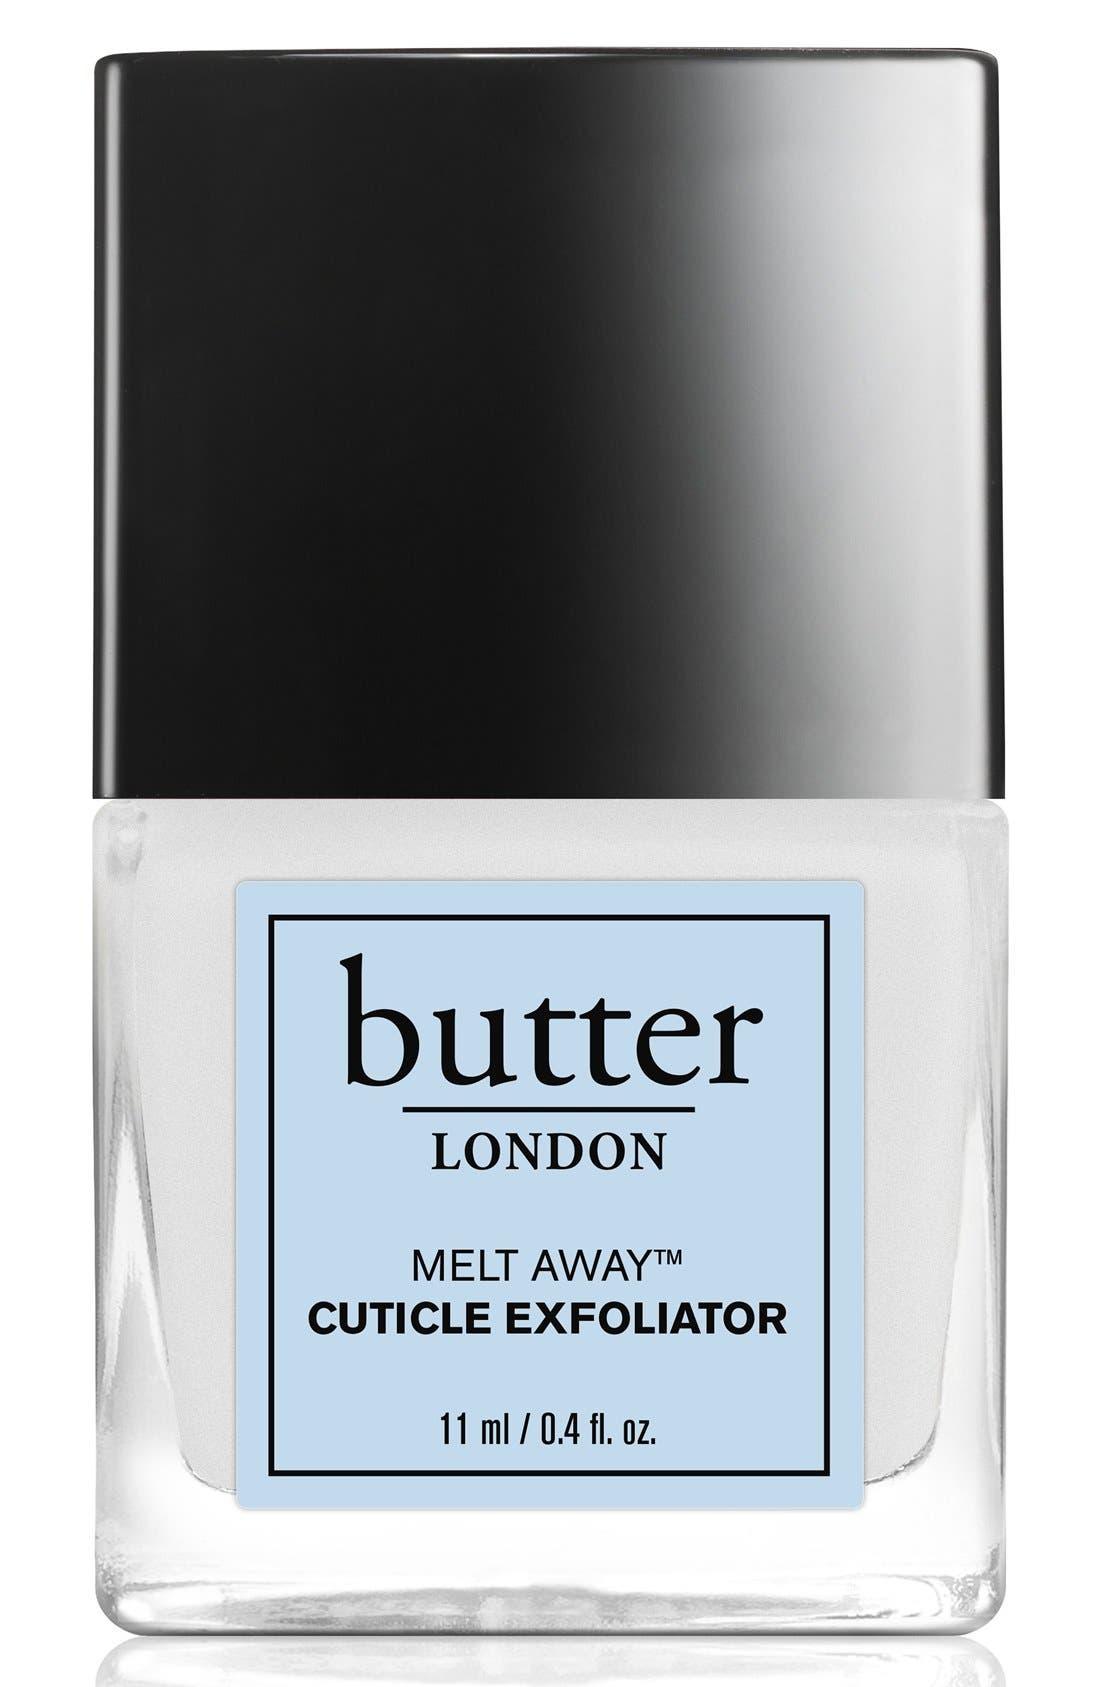 butter LONDON 'Melt Away™' Cuticle Exfoliator